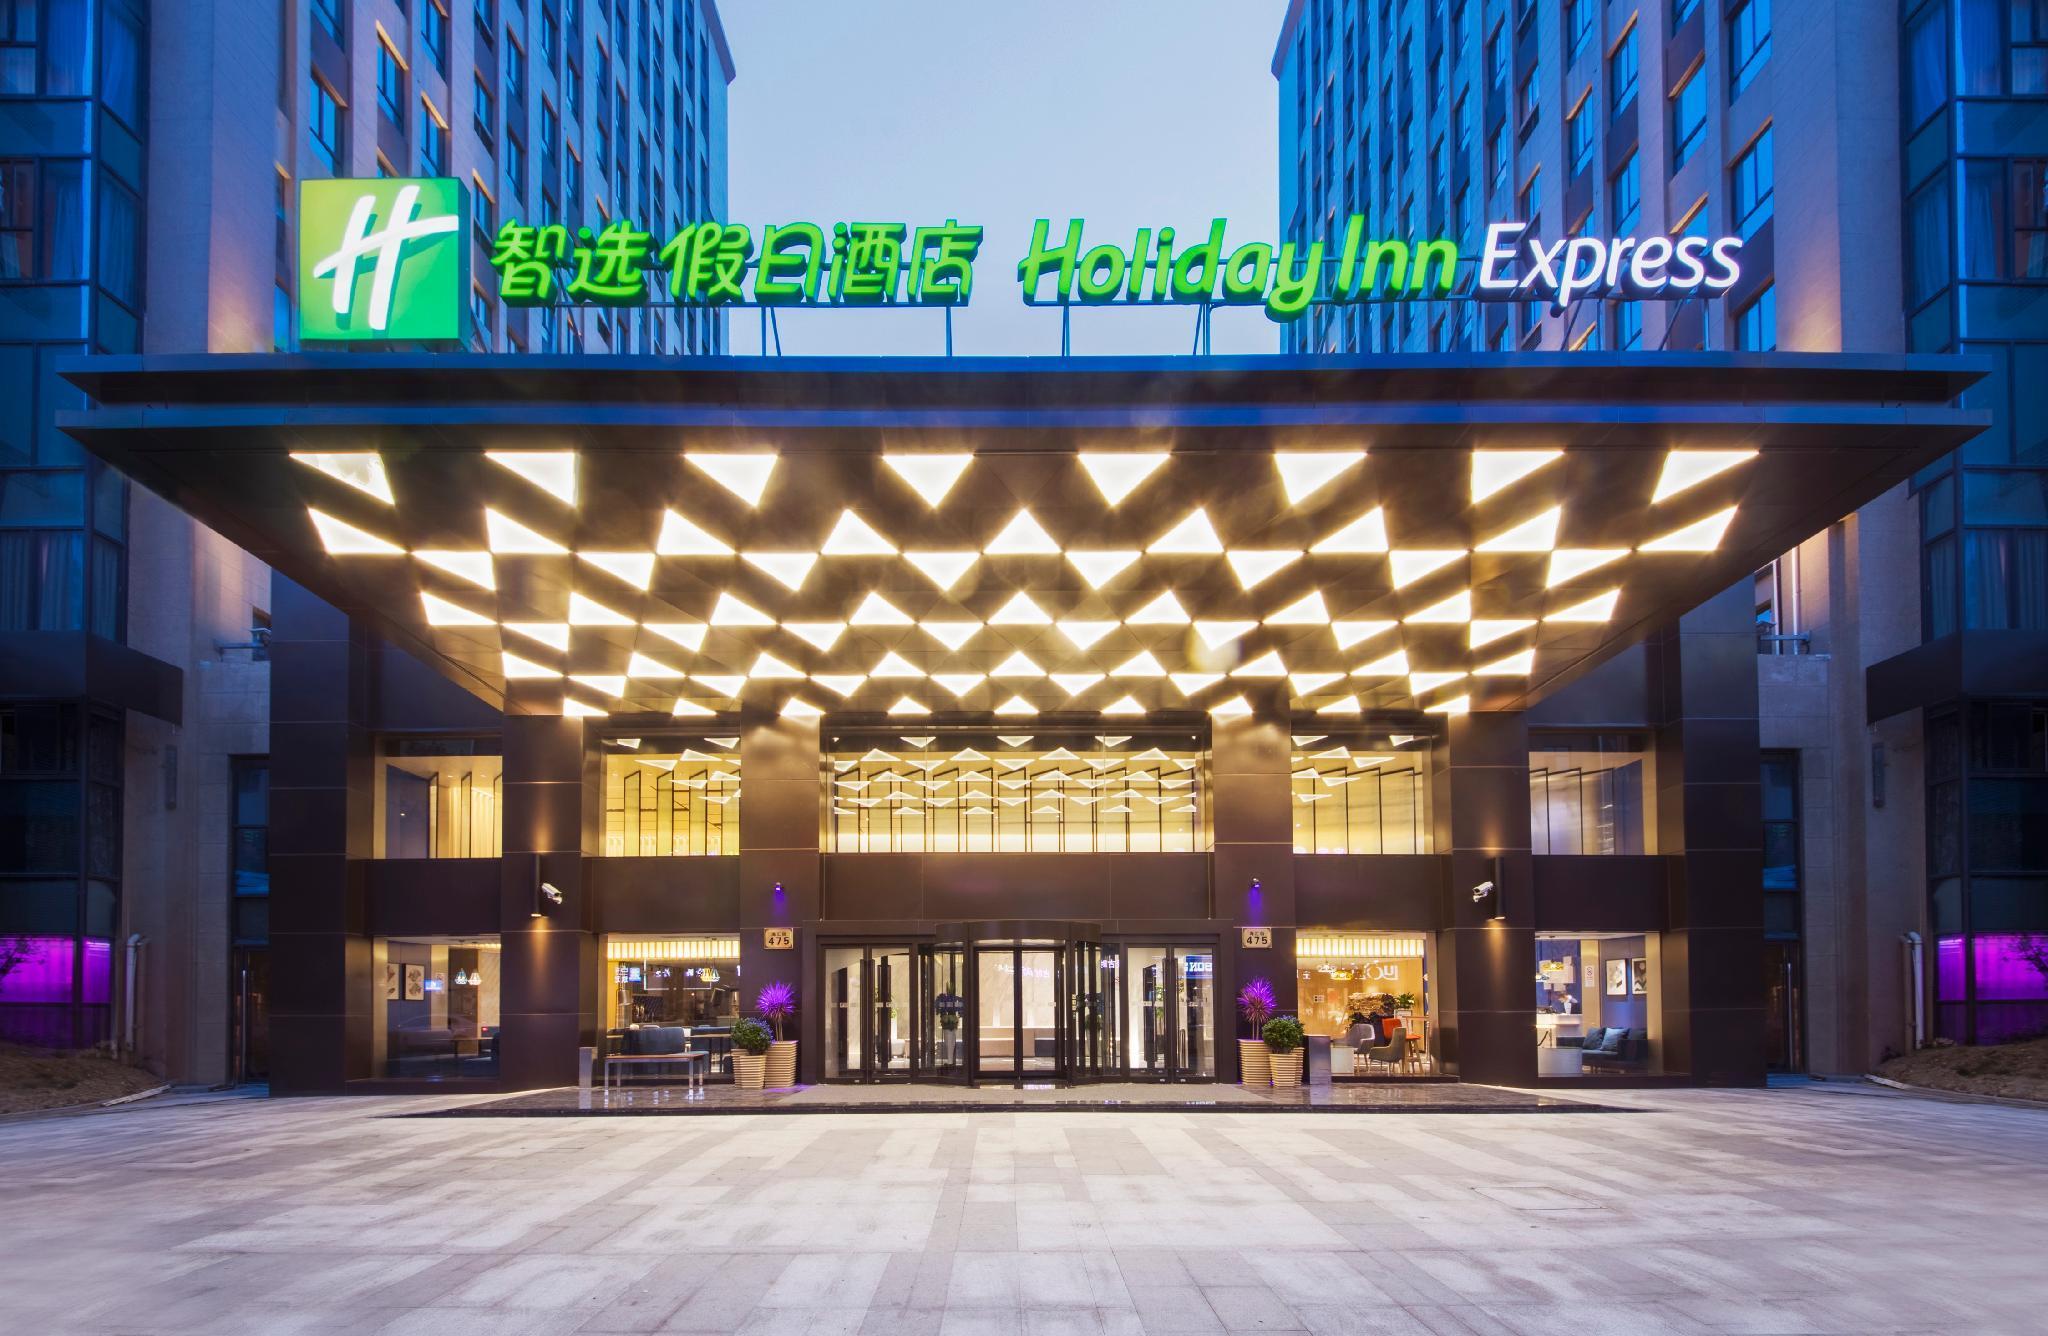 Holiday Inn Express Shanghai Jinshan